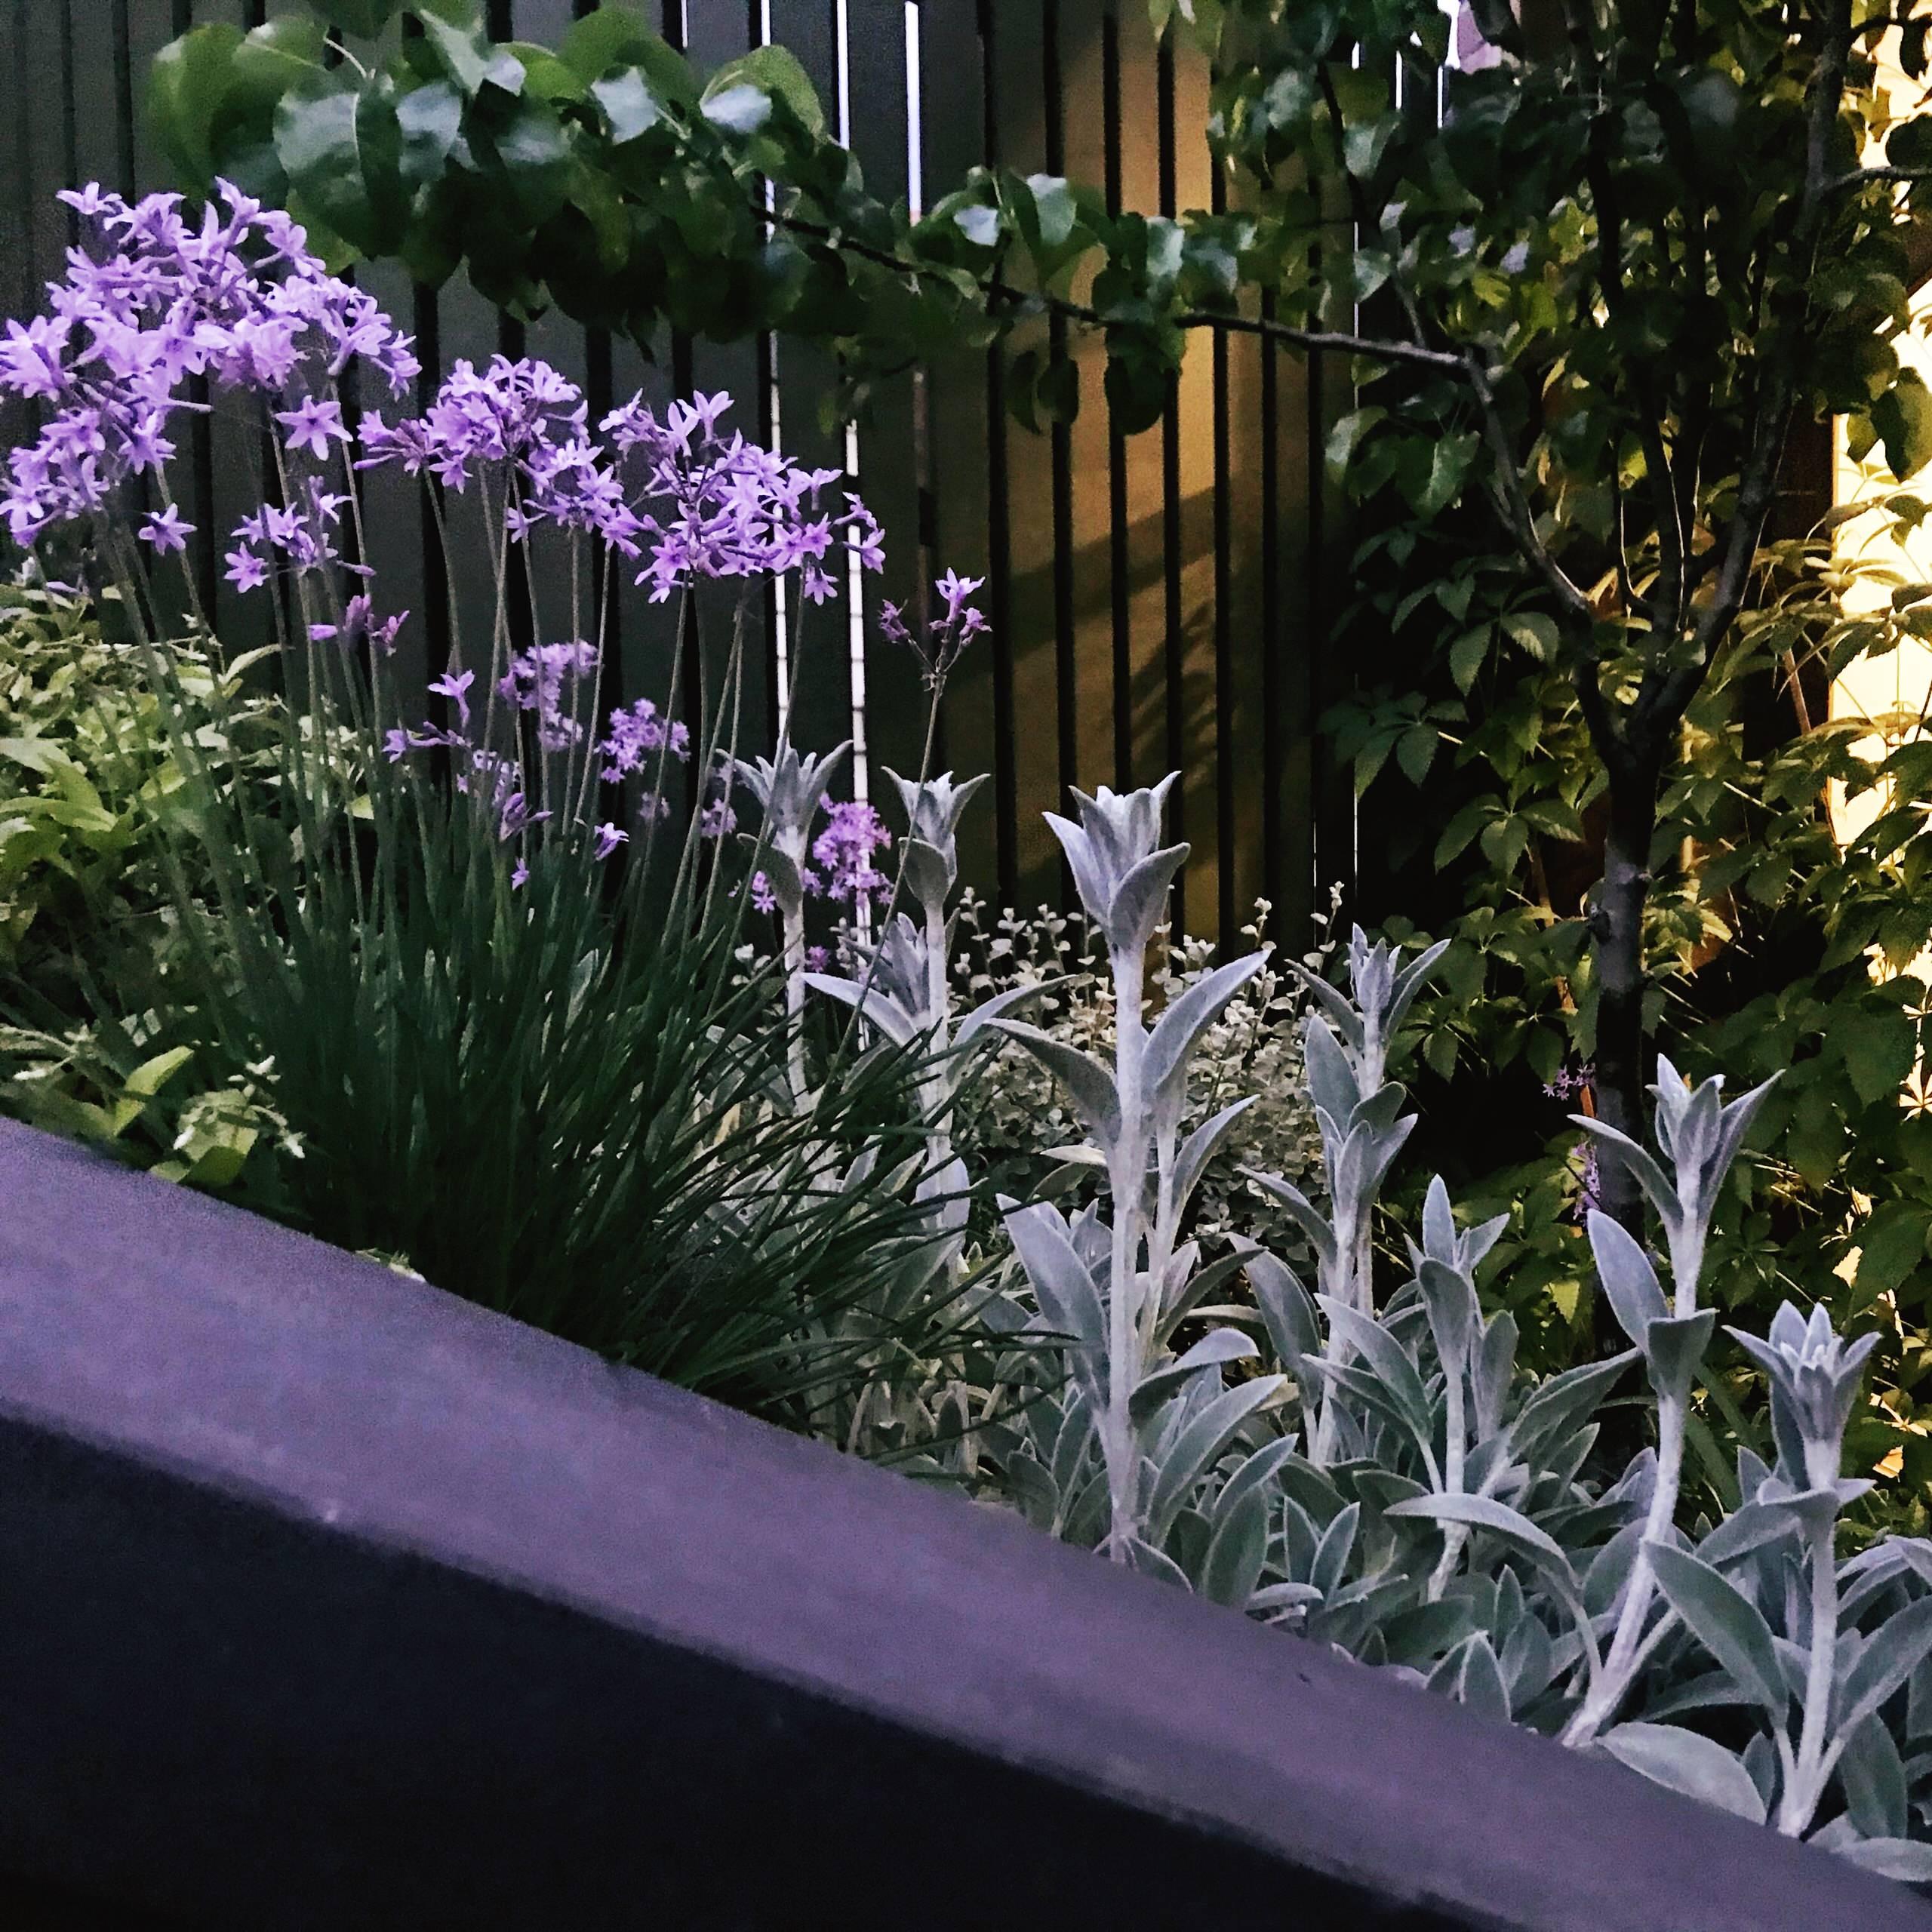 'Welkin', Colourful Rooftop Terrace & Garden in Clifton Hill